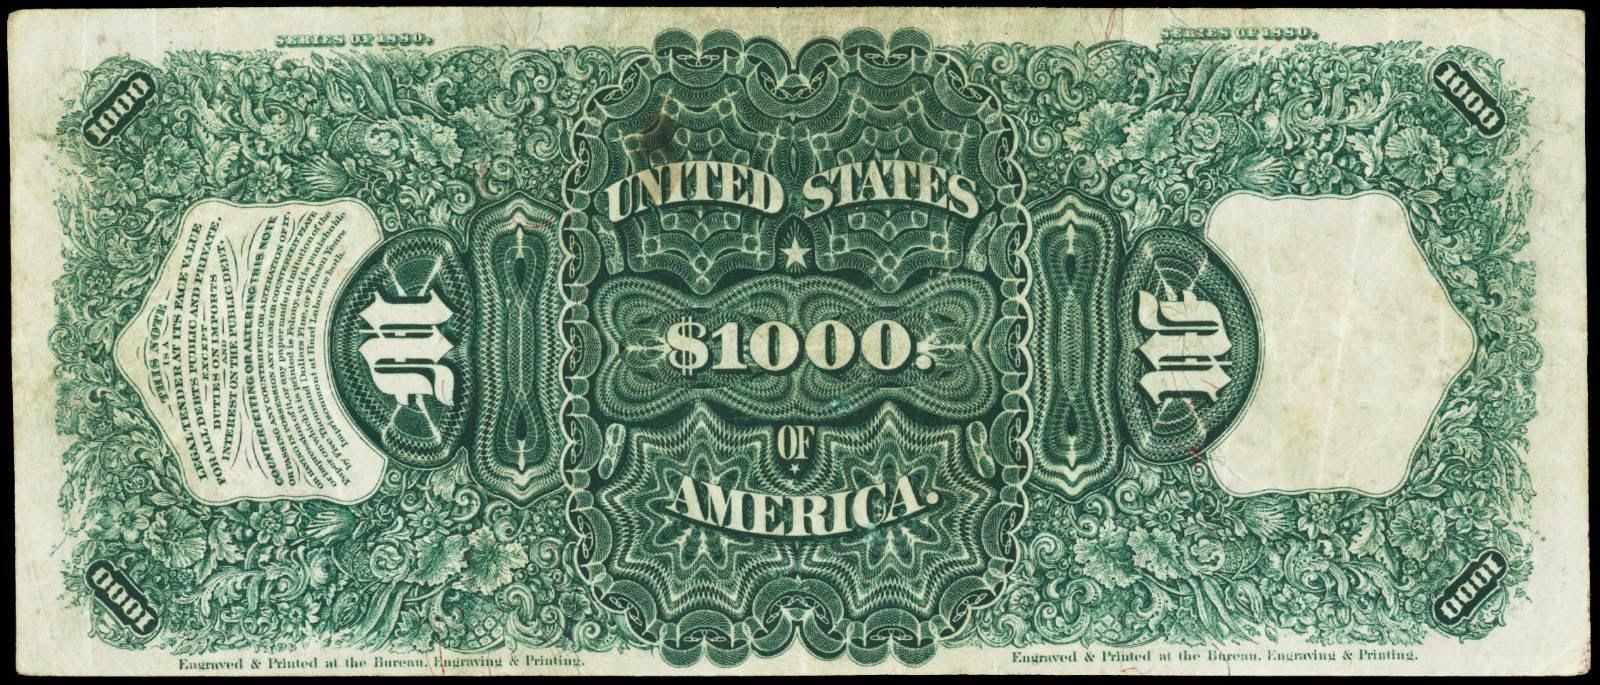 1880 $1000 Dollars United States Note